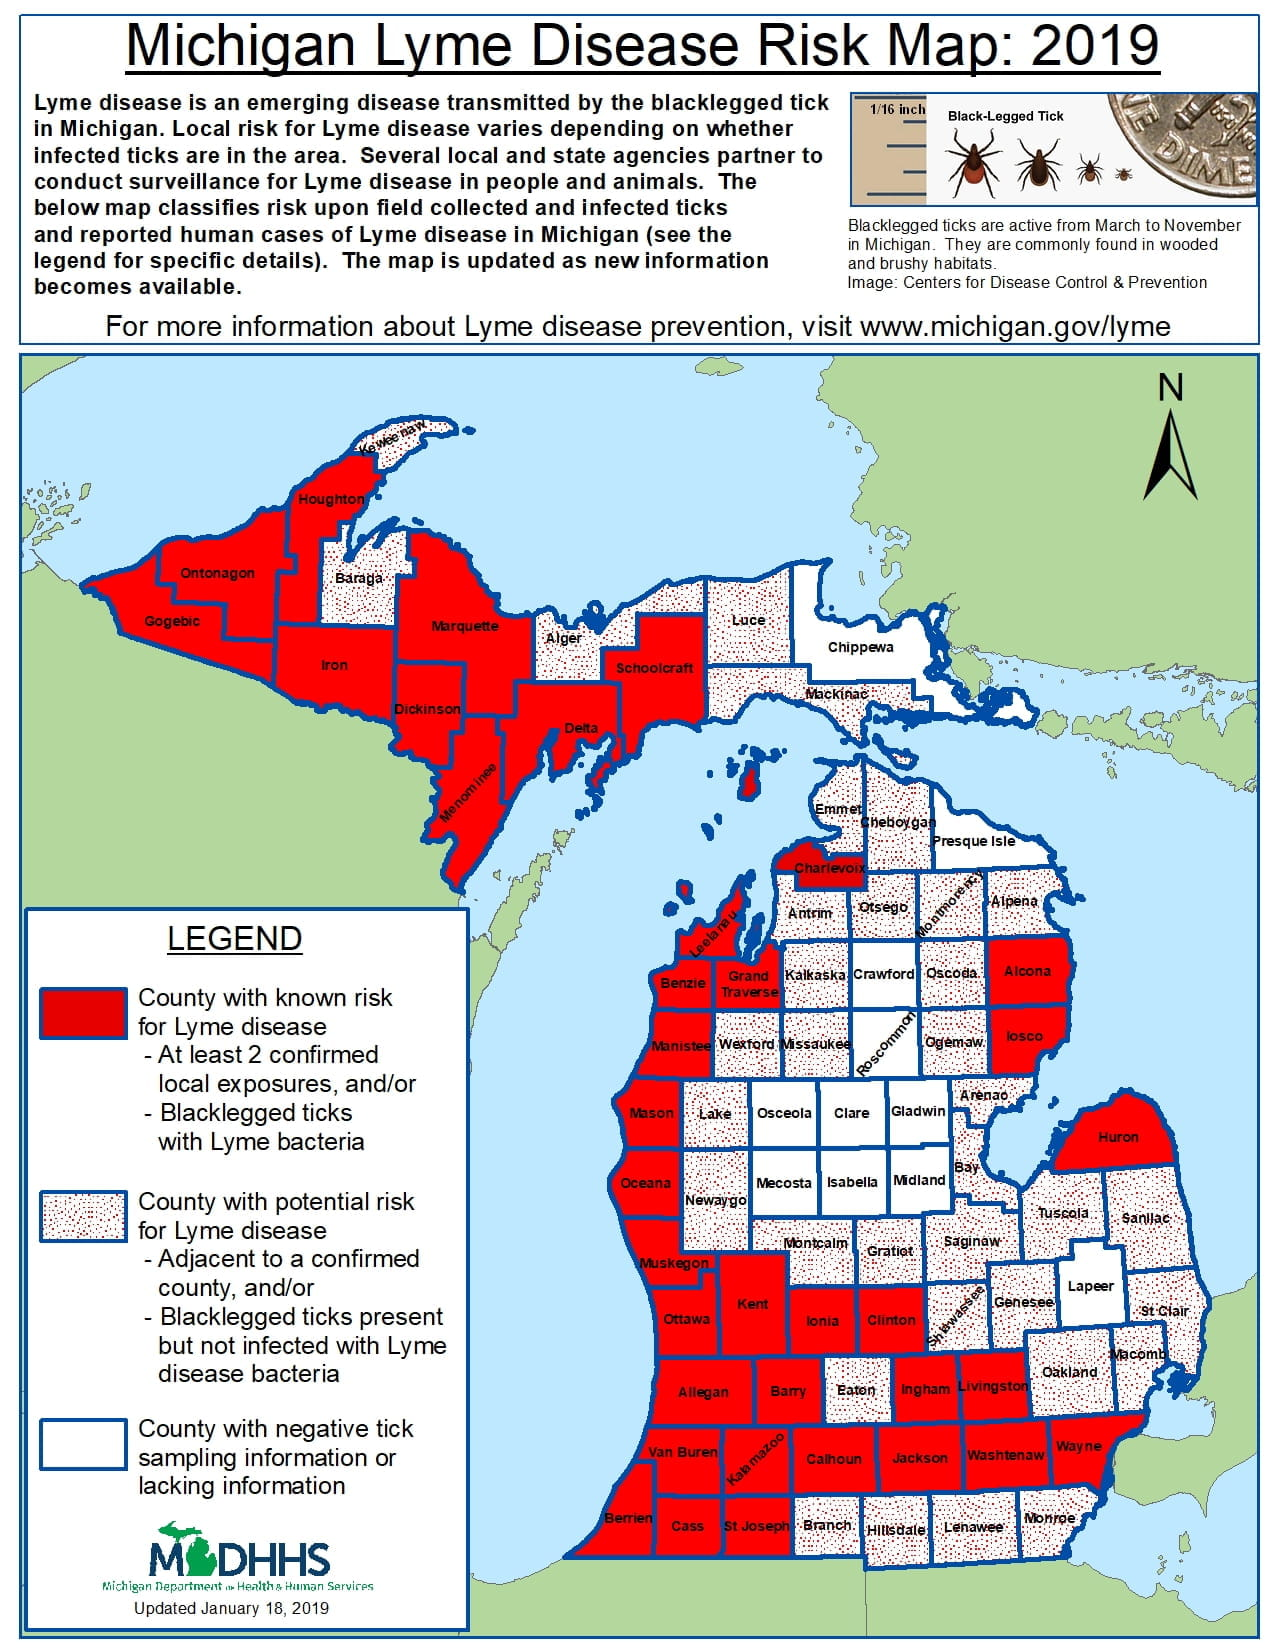 U M Biologist Describes Support For Ann Arbor Deer Cull